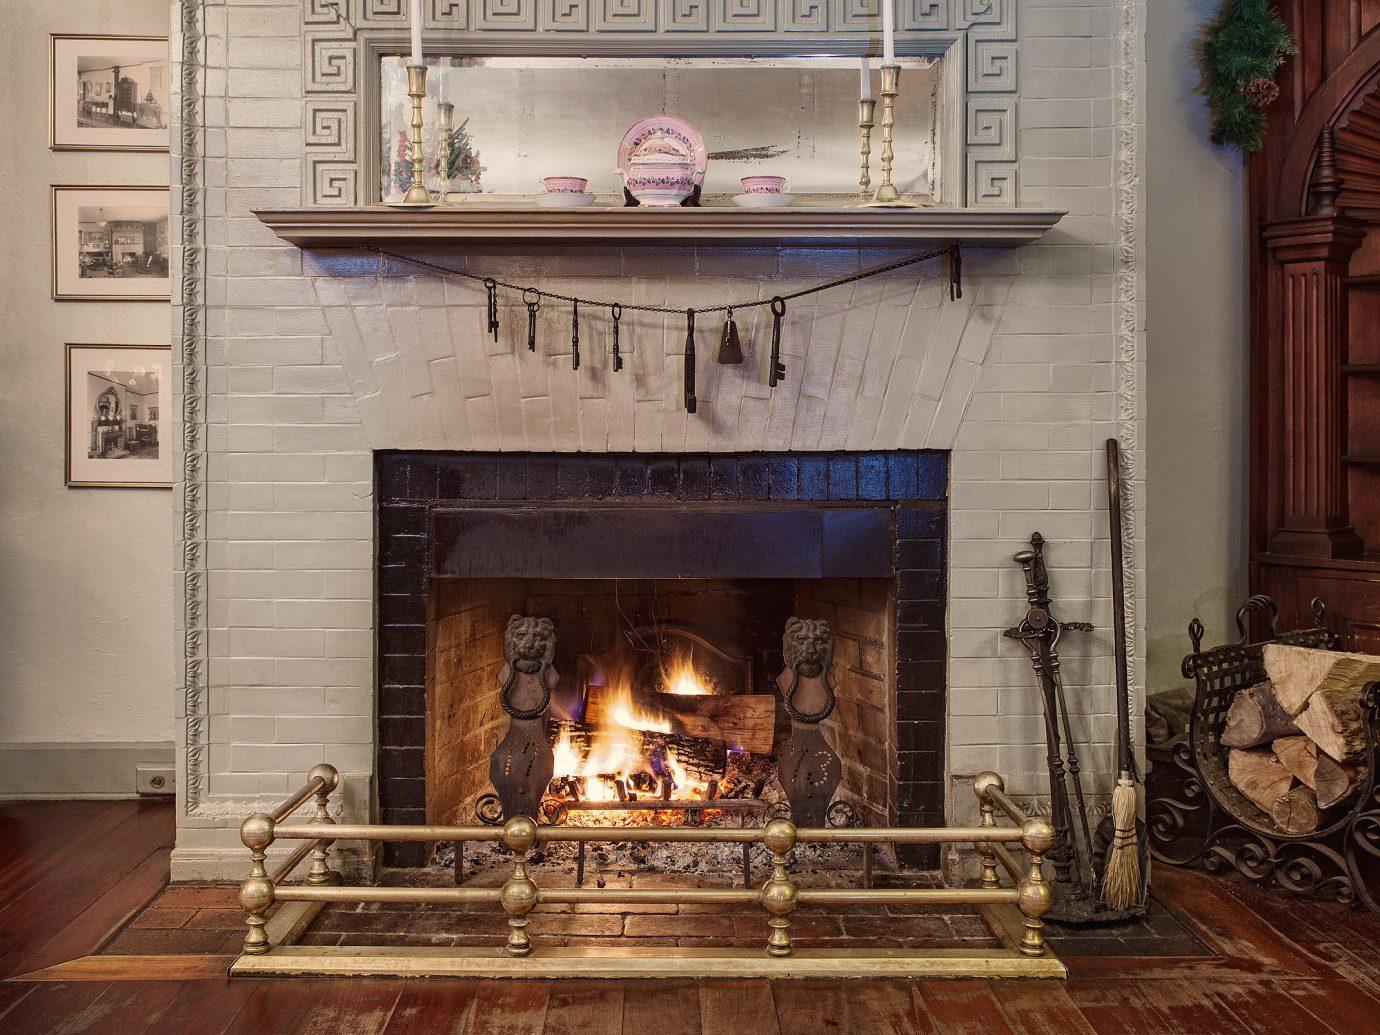 Romance Trip Ideas Fireplace fire indoor floor Living hearth room wood burning stove interior design living room home furniture flooring stone